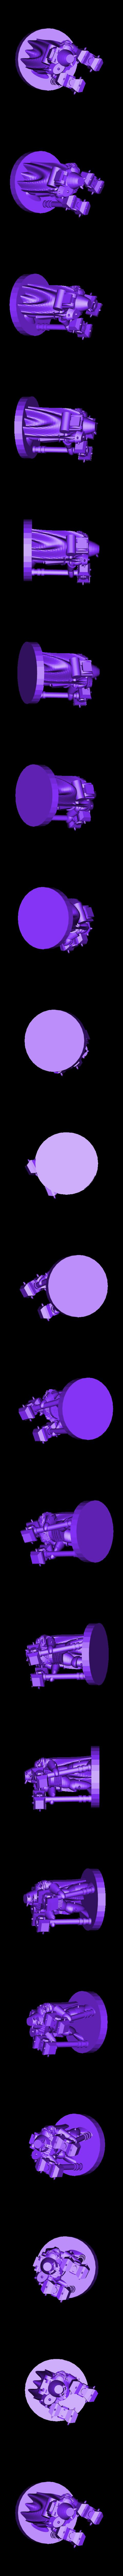 Dwarf_Fighter_2_Hammers.stl Download free STL file DnD Dwarf • 3D printable object, mrhers2